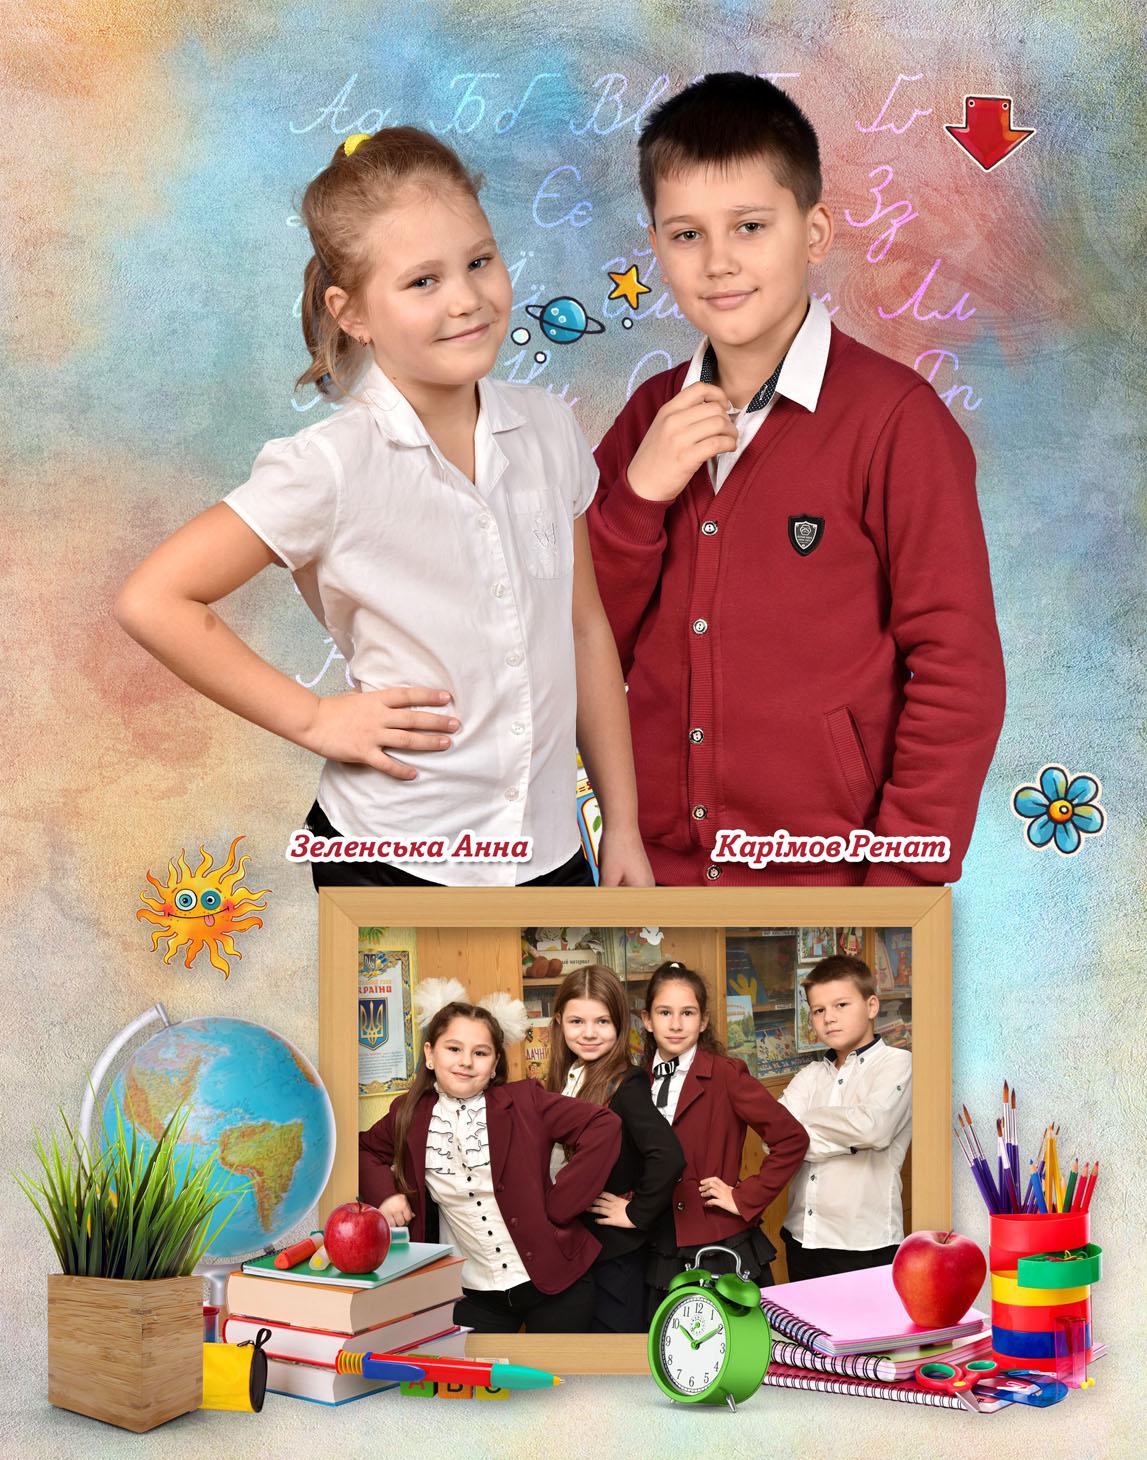 https://school-photo.com.ua/wp-content/uploads/2017/09/09-copy-2.jpg